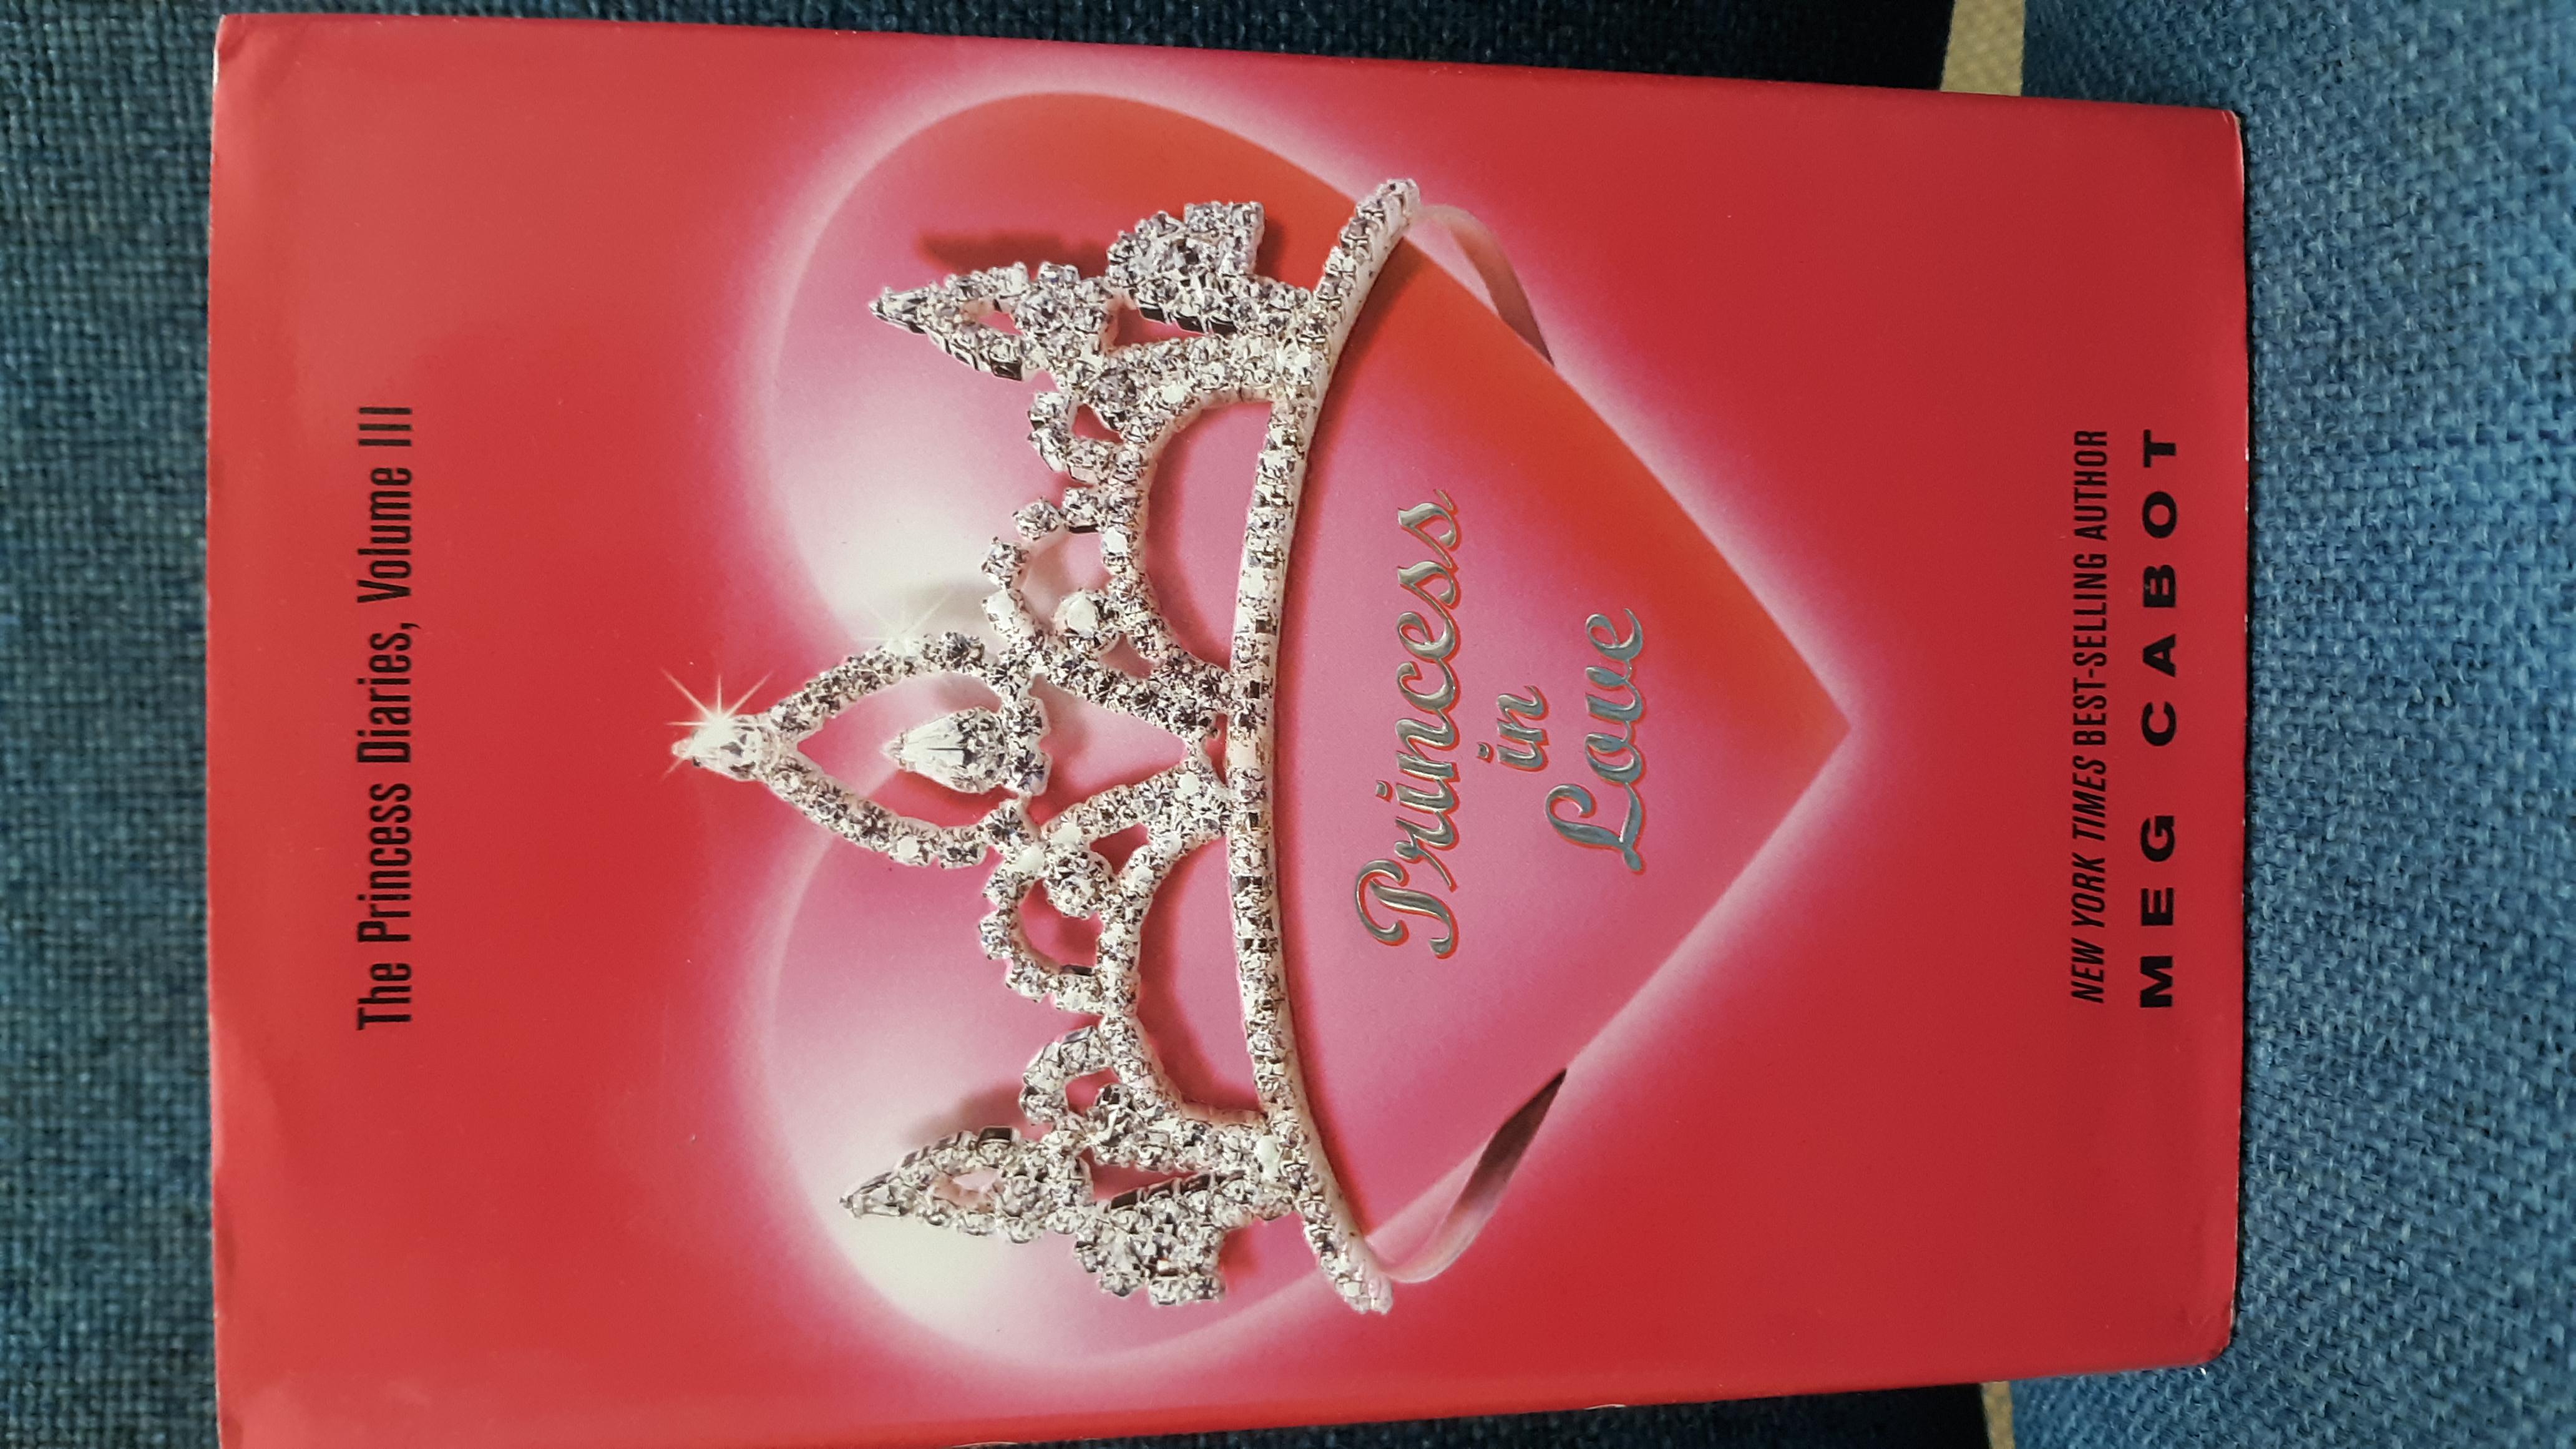 https://0201.nccdn.net/1_2/000/000/12f/5cd/princess-in-love.jpg